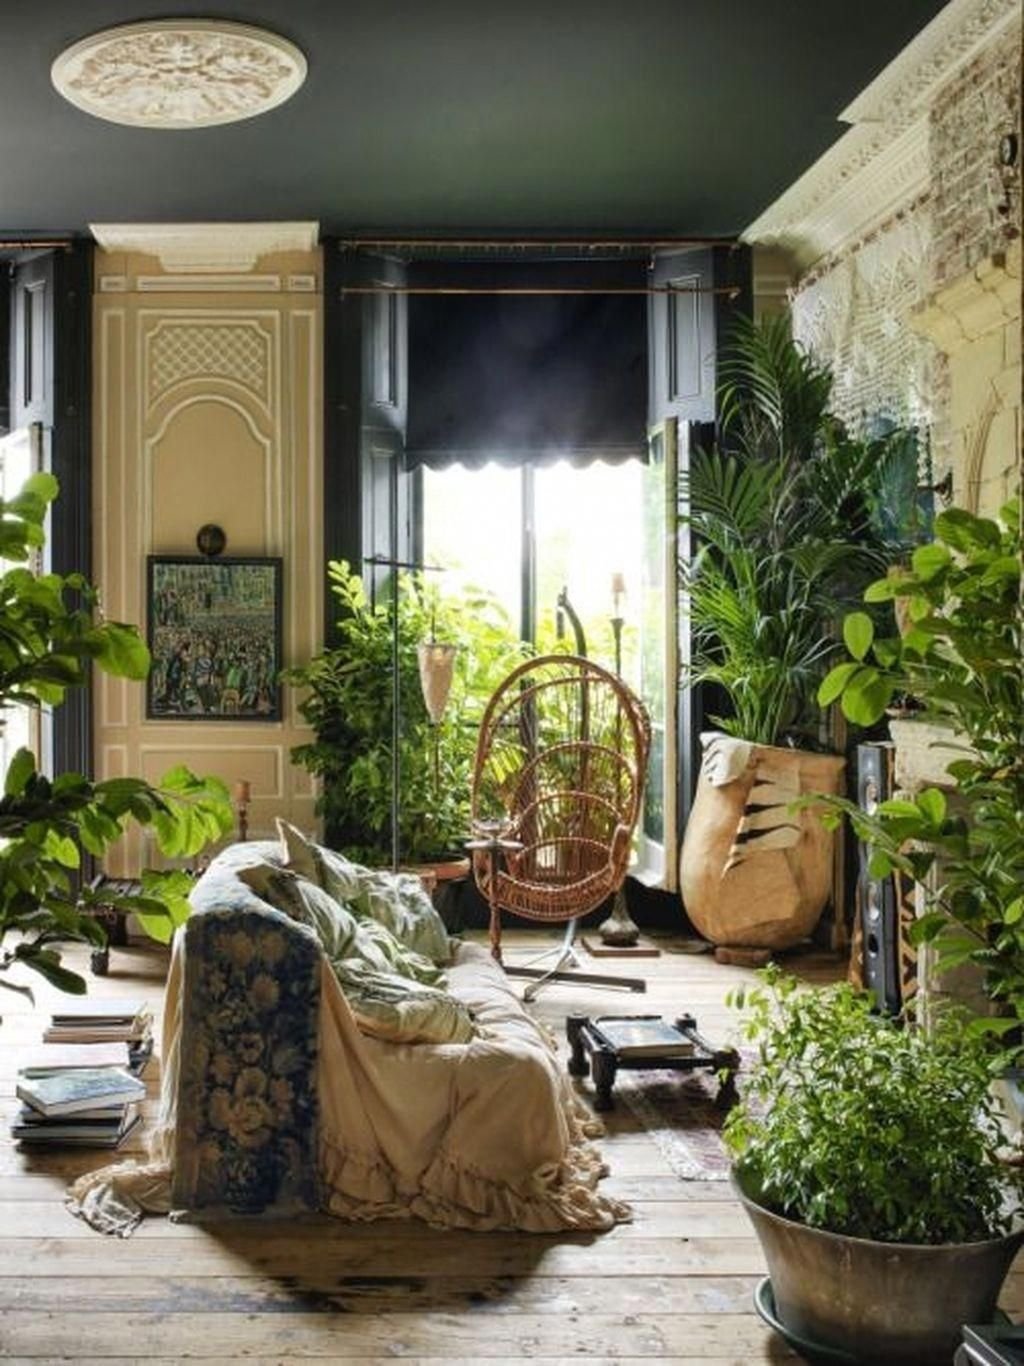 Home decoration cheap ideas plantsforhomedecoration code 9334492885